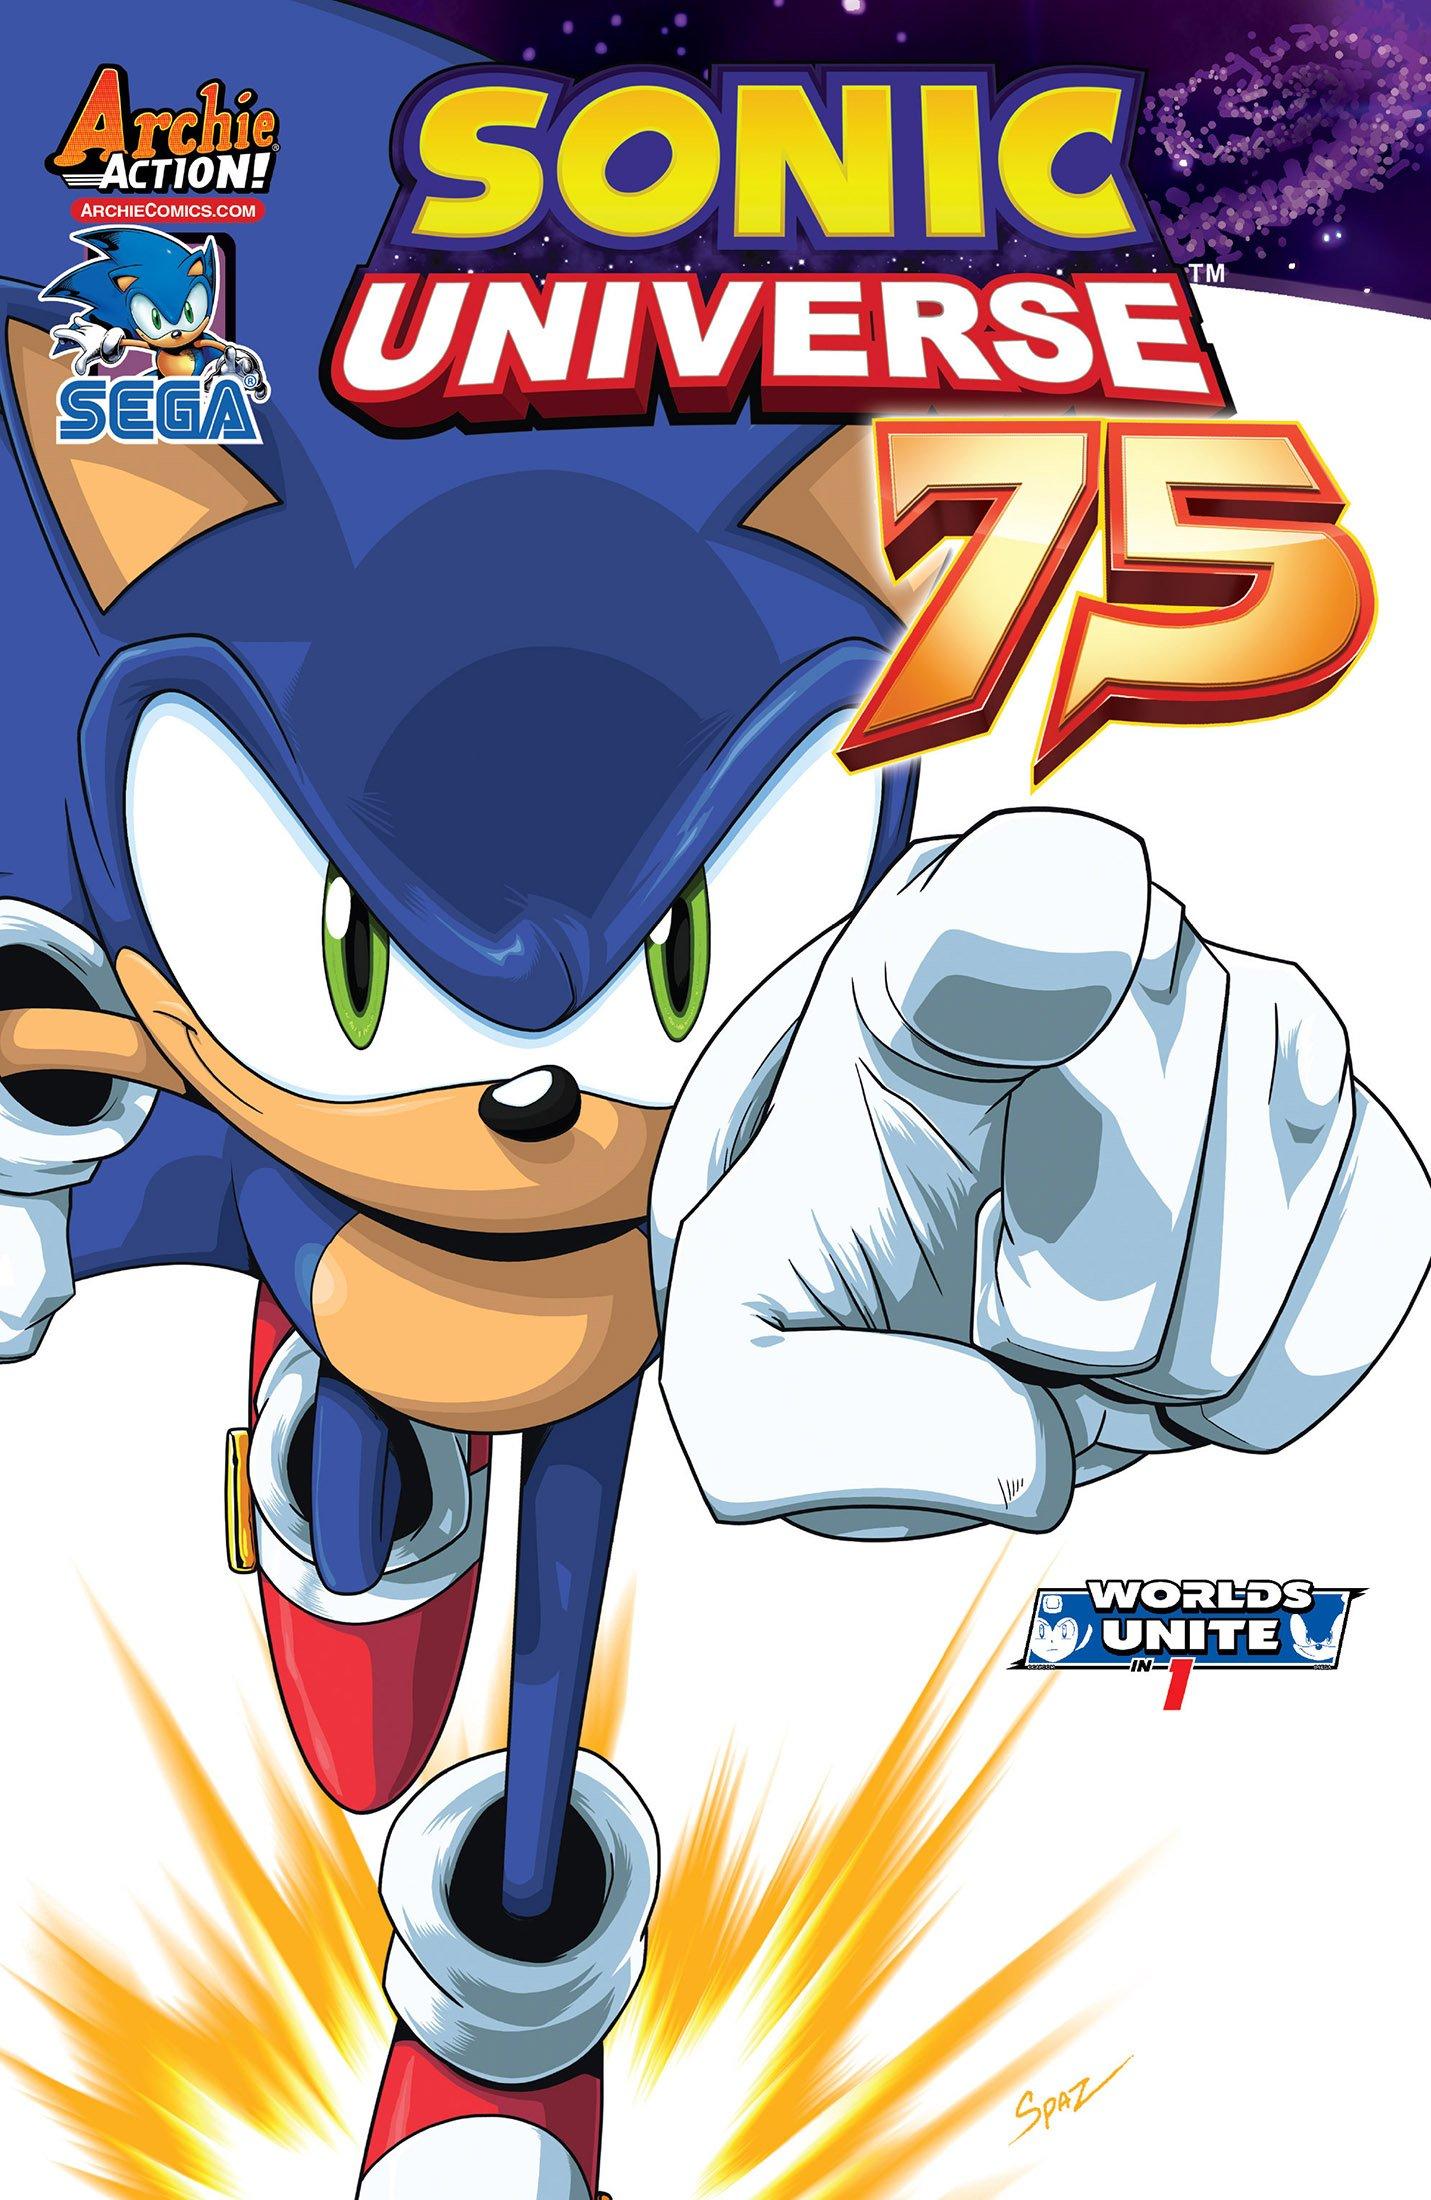 Sonic Universe 075 (June 2015)